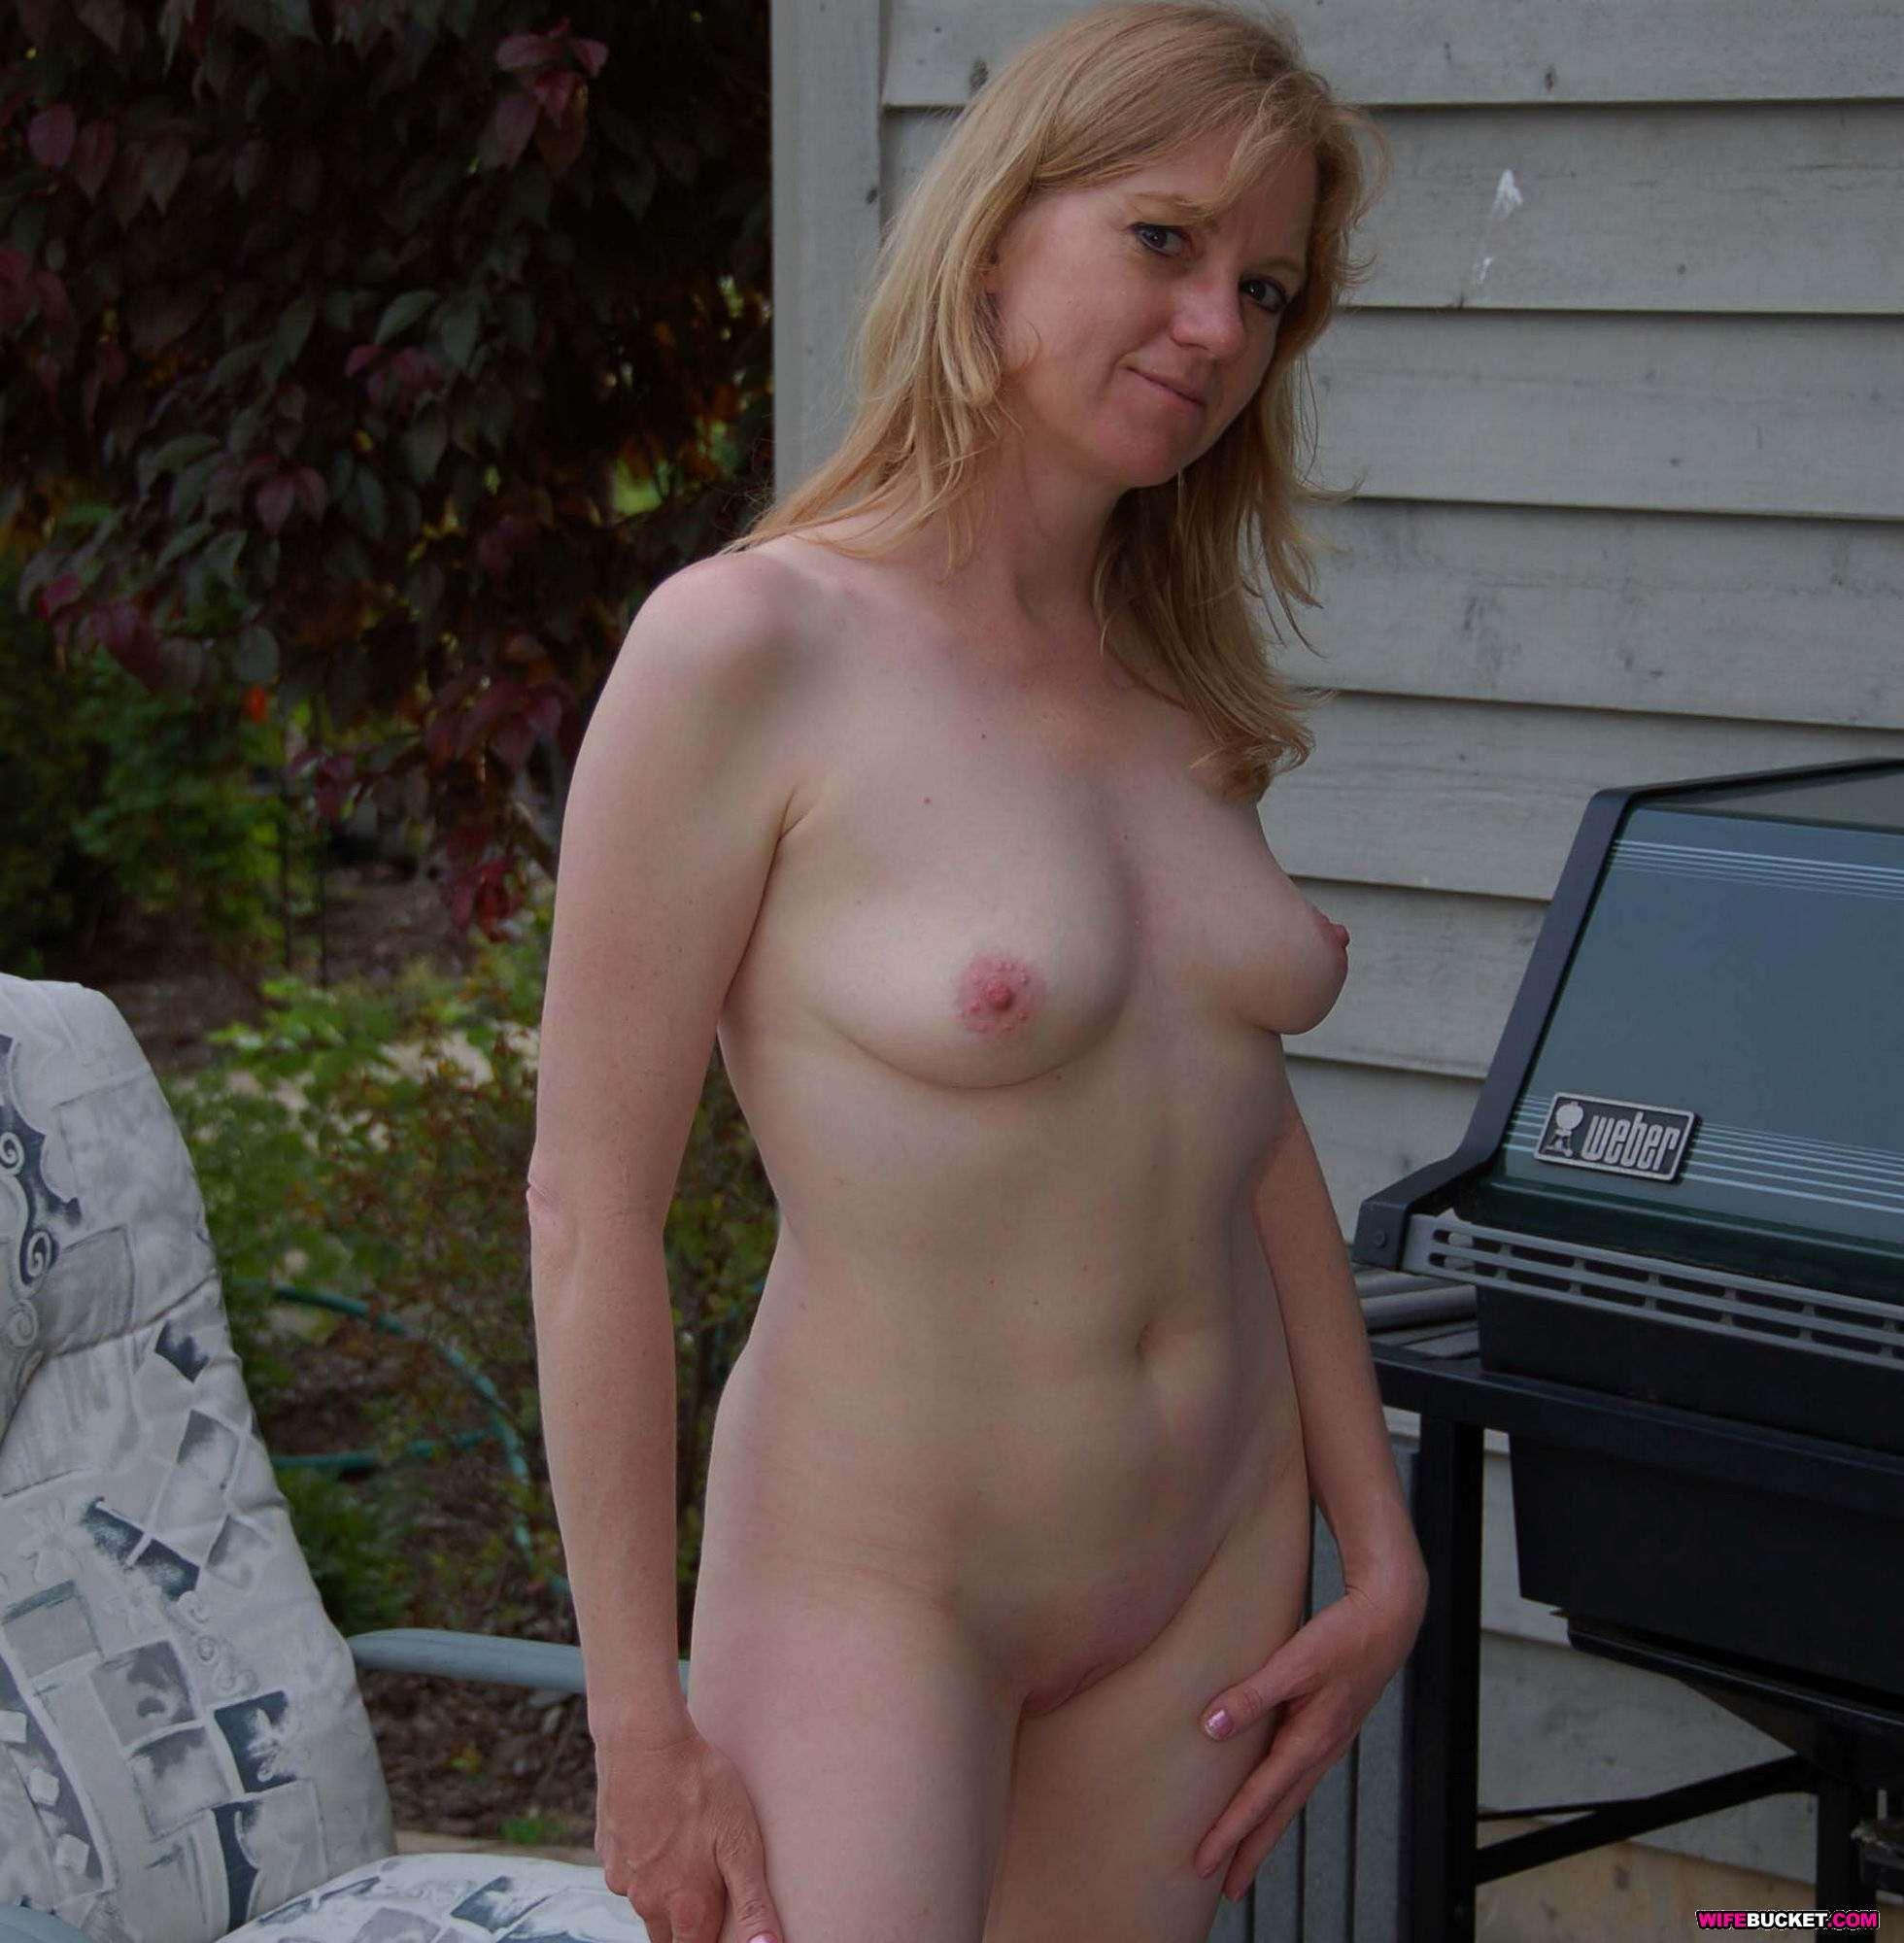 Best free amateur porn galleries